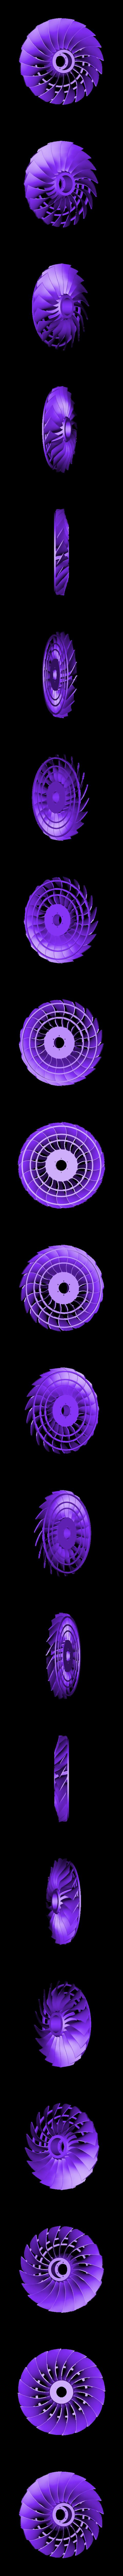 Fan-Blade201ws.stl Download free STL file Jet Engine, 3-Spool • 3D printable object, konchan77